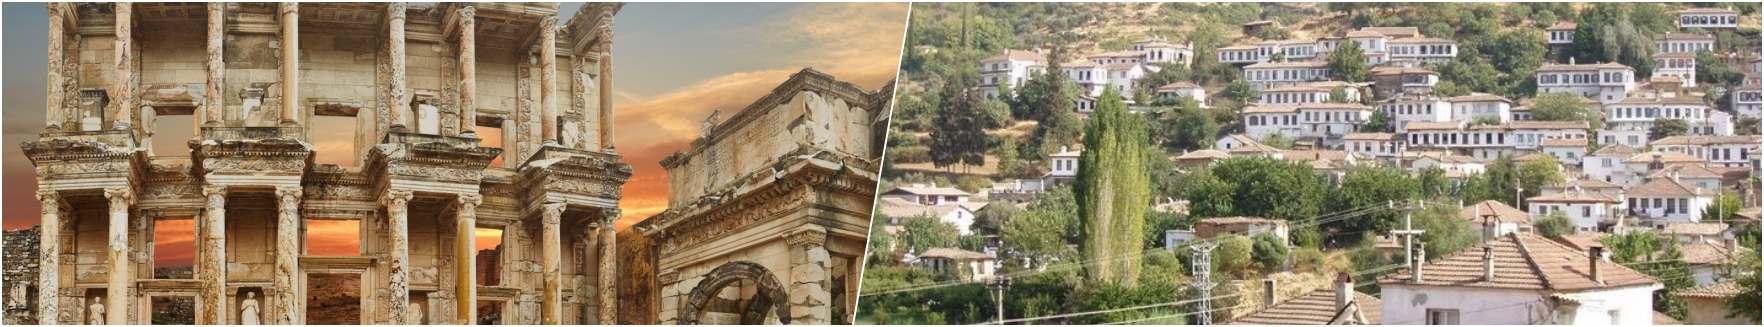 Ephesus - Kirkitze